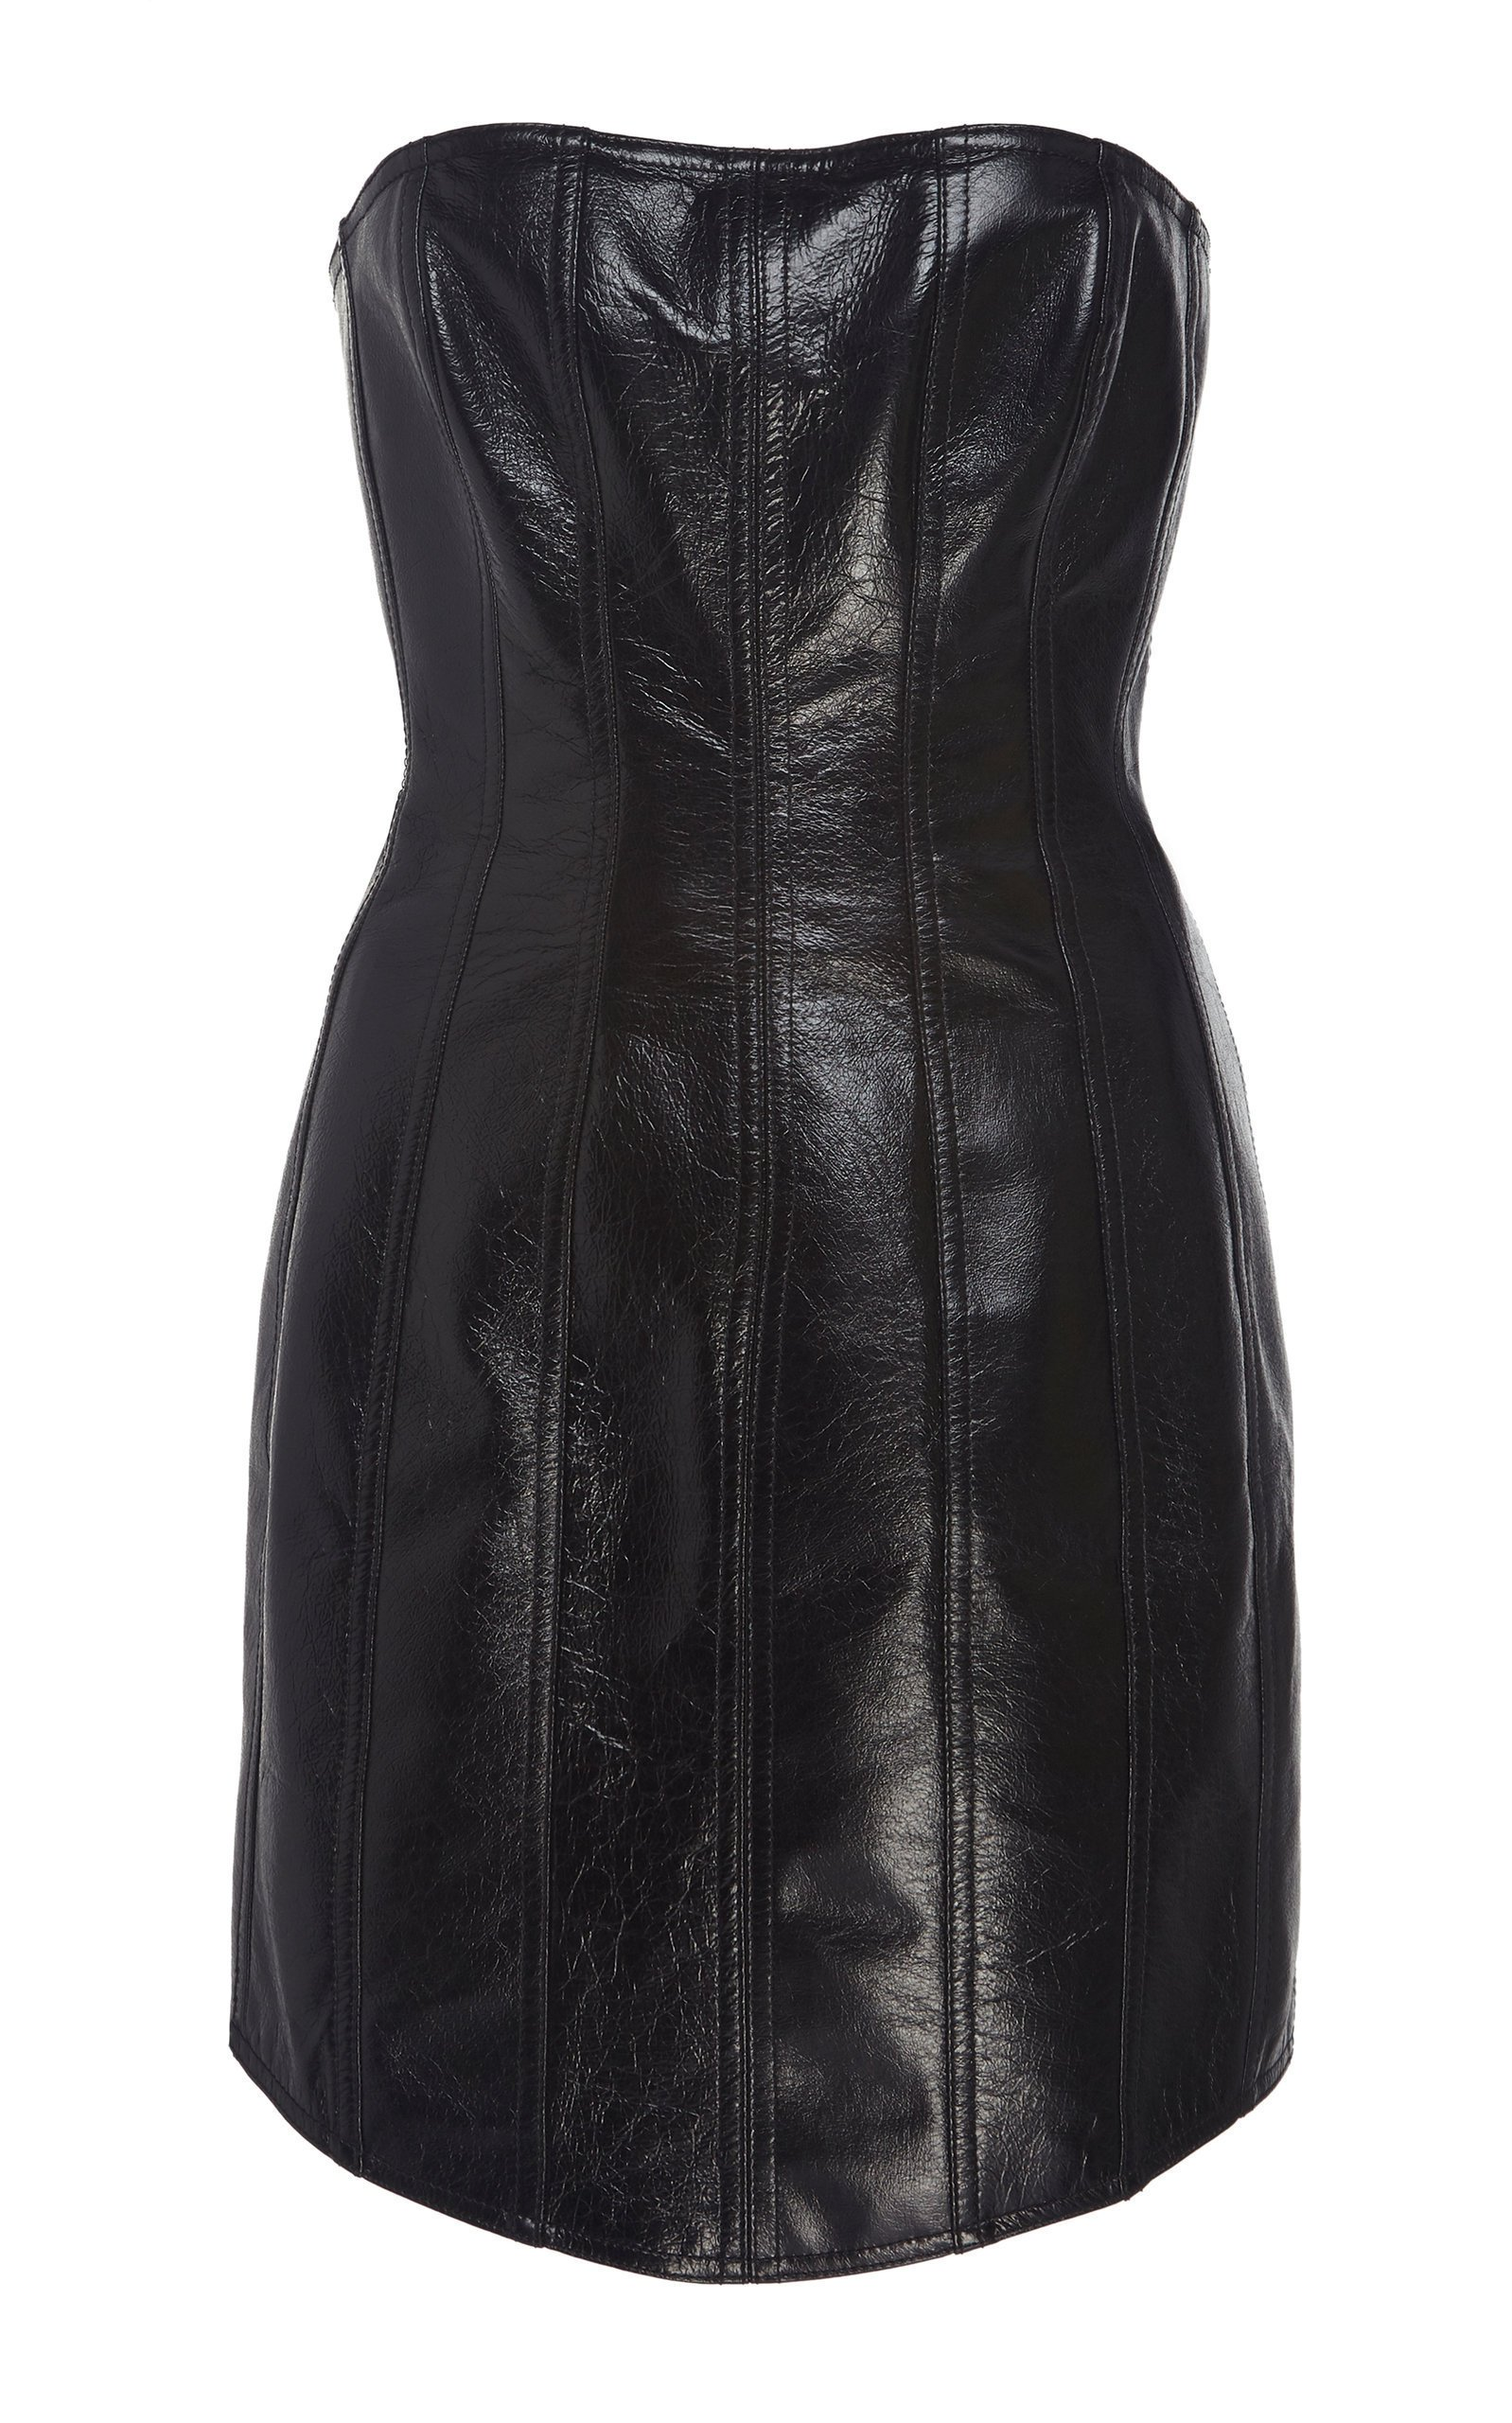 David Koma Corset Leather Strapless Dress